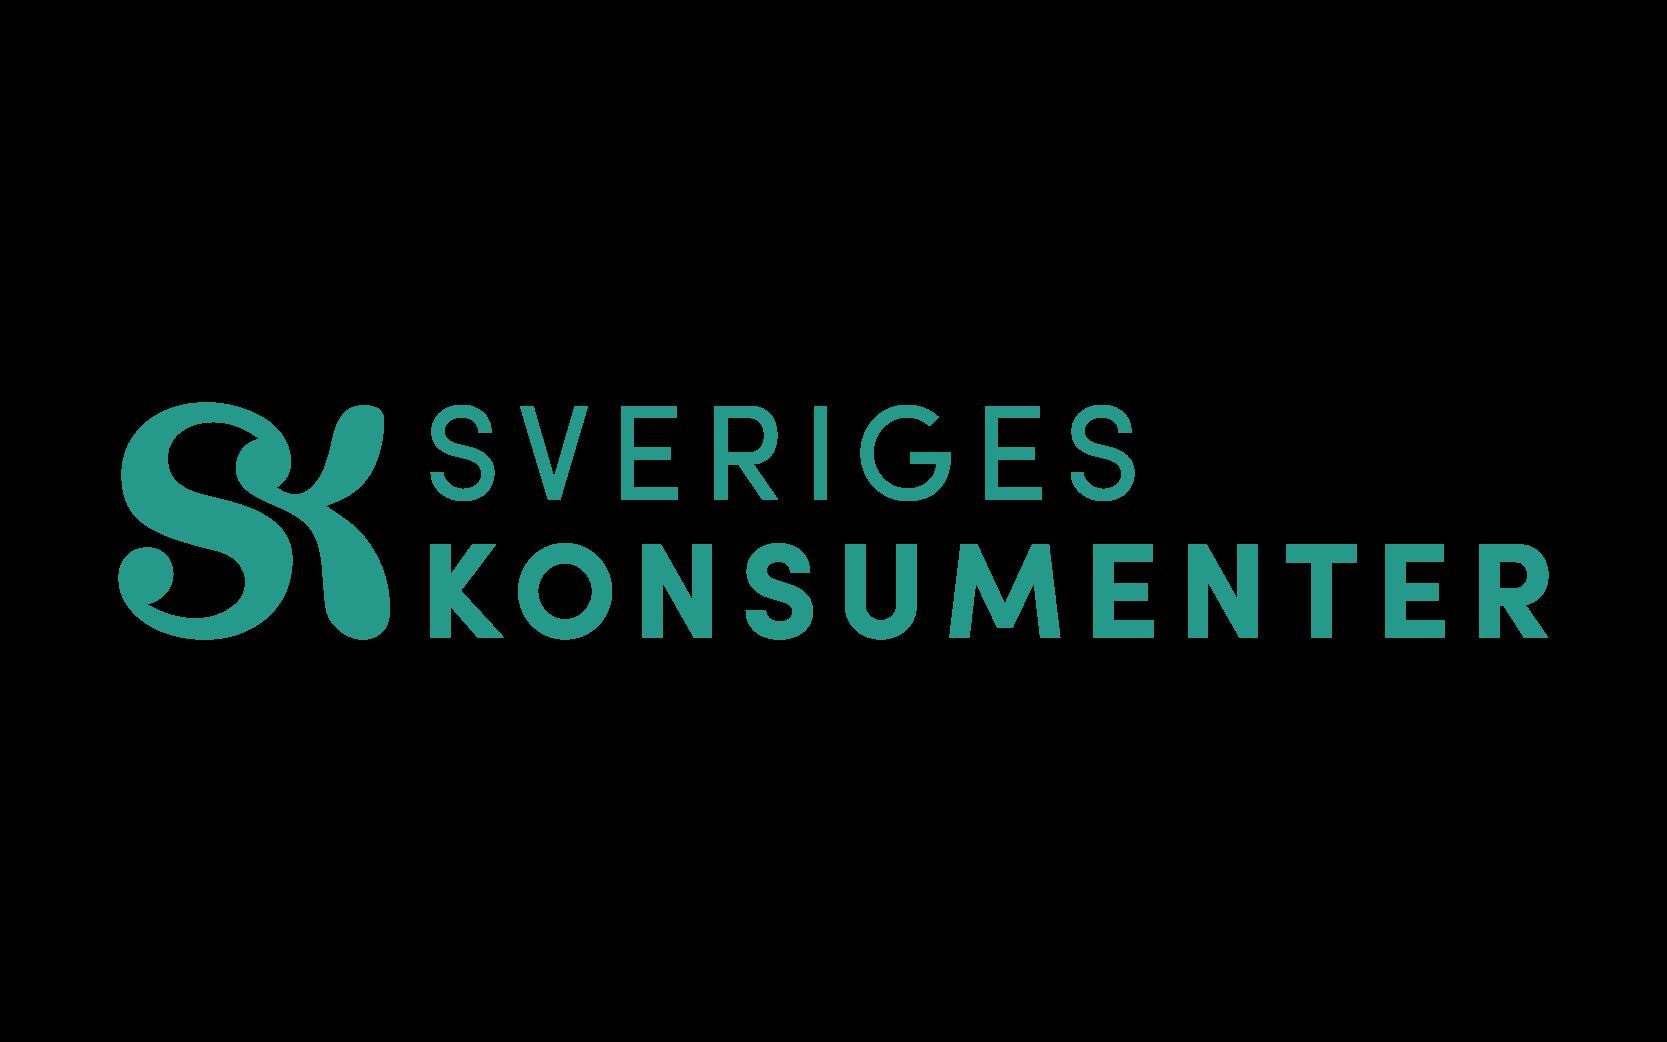 Sveriges konsumenters logotyp